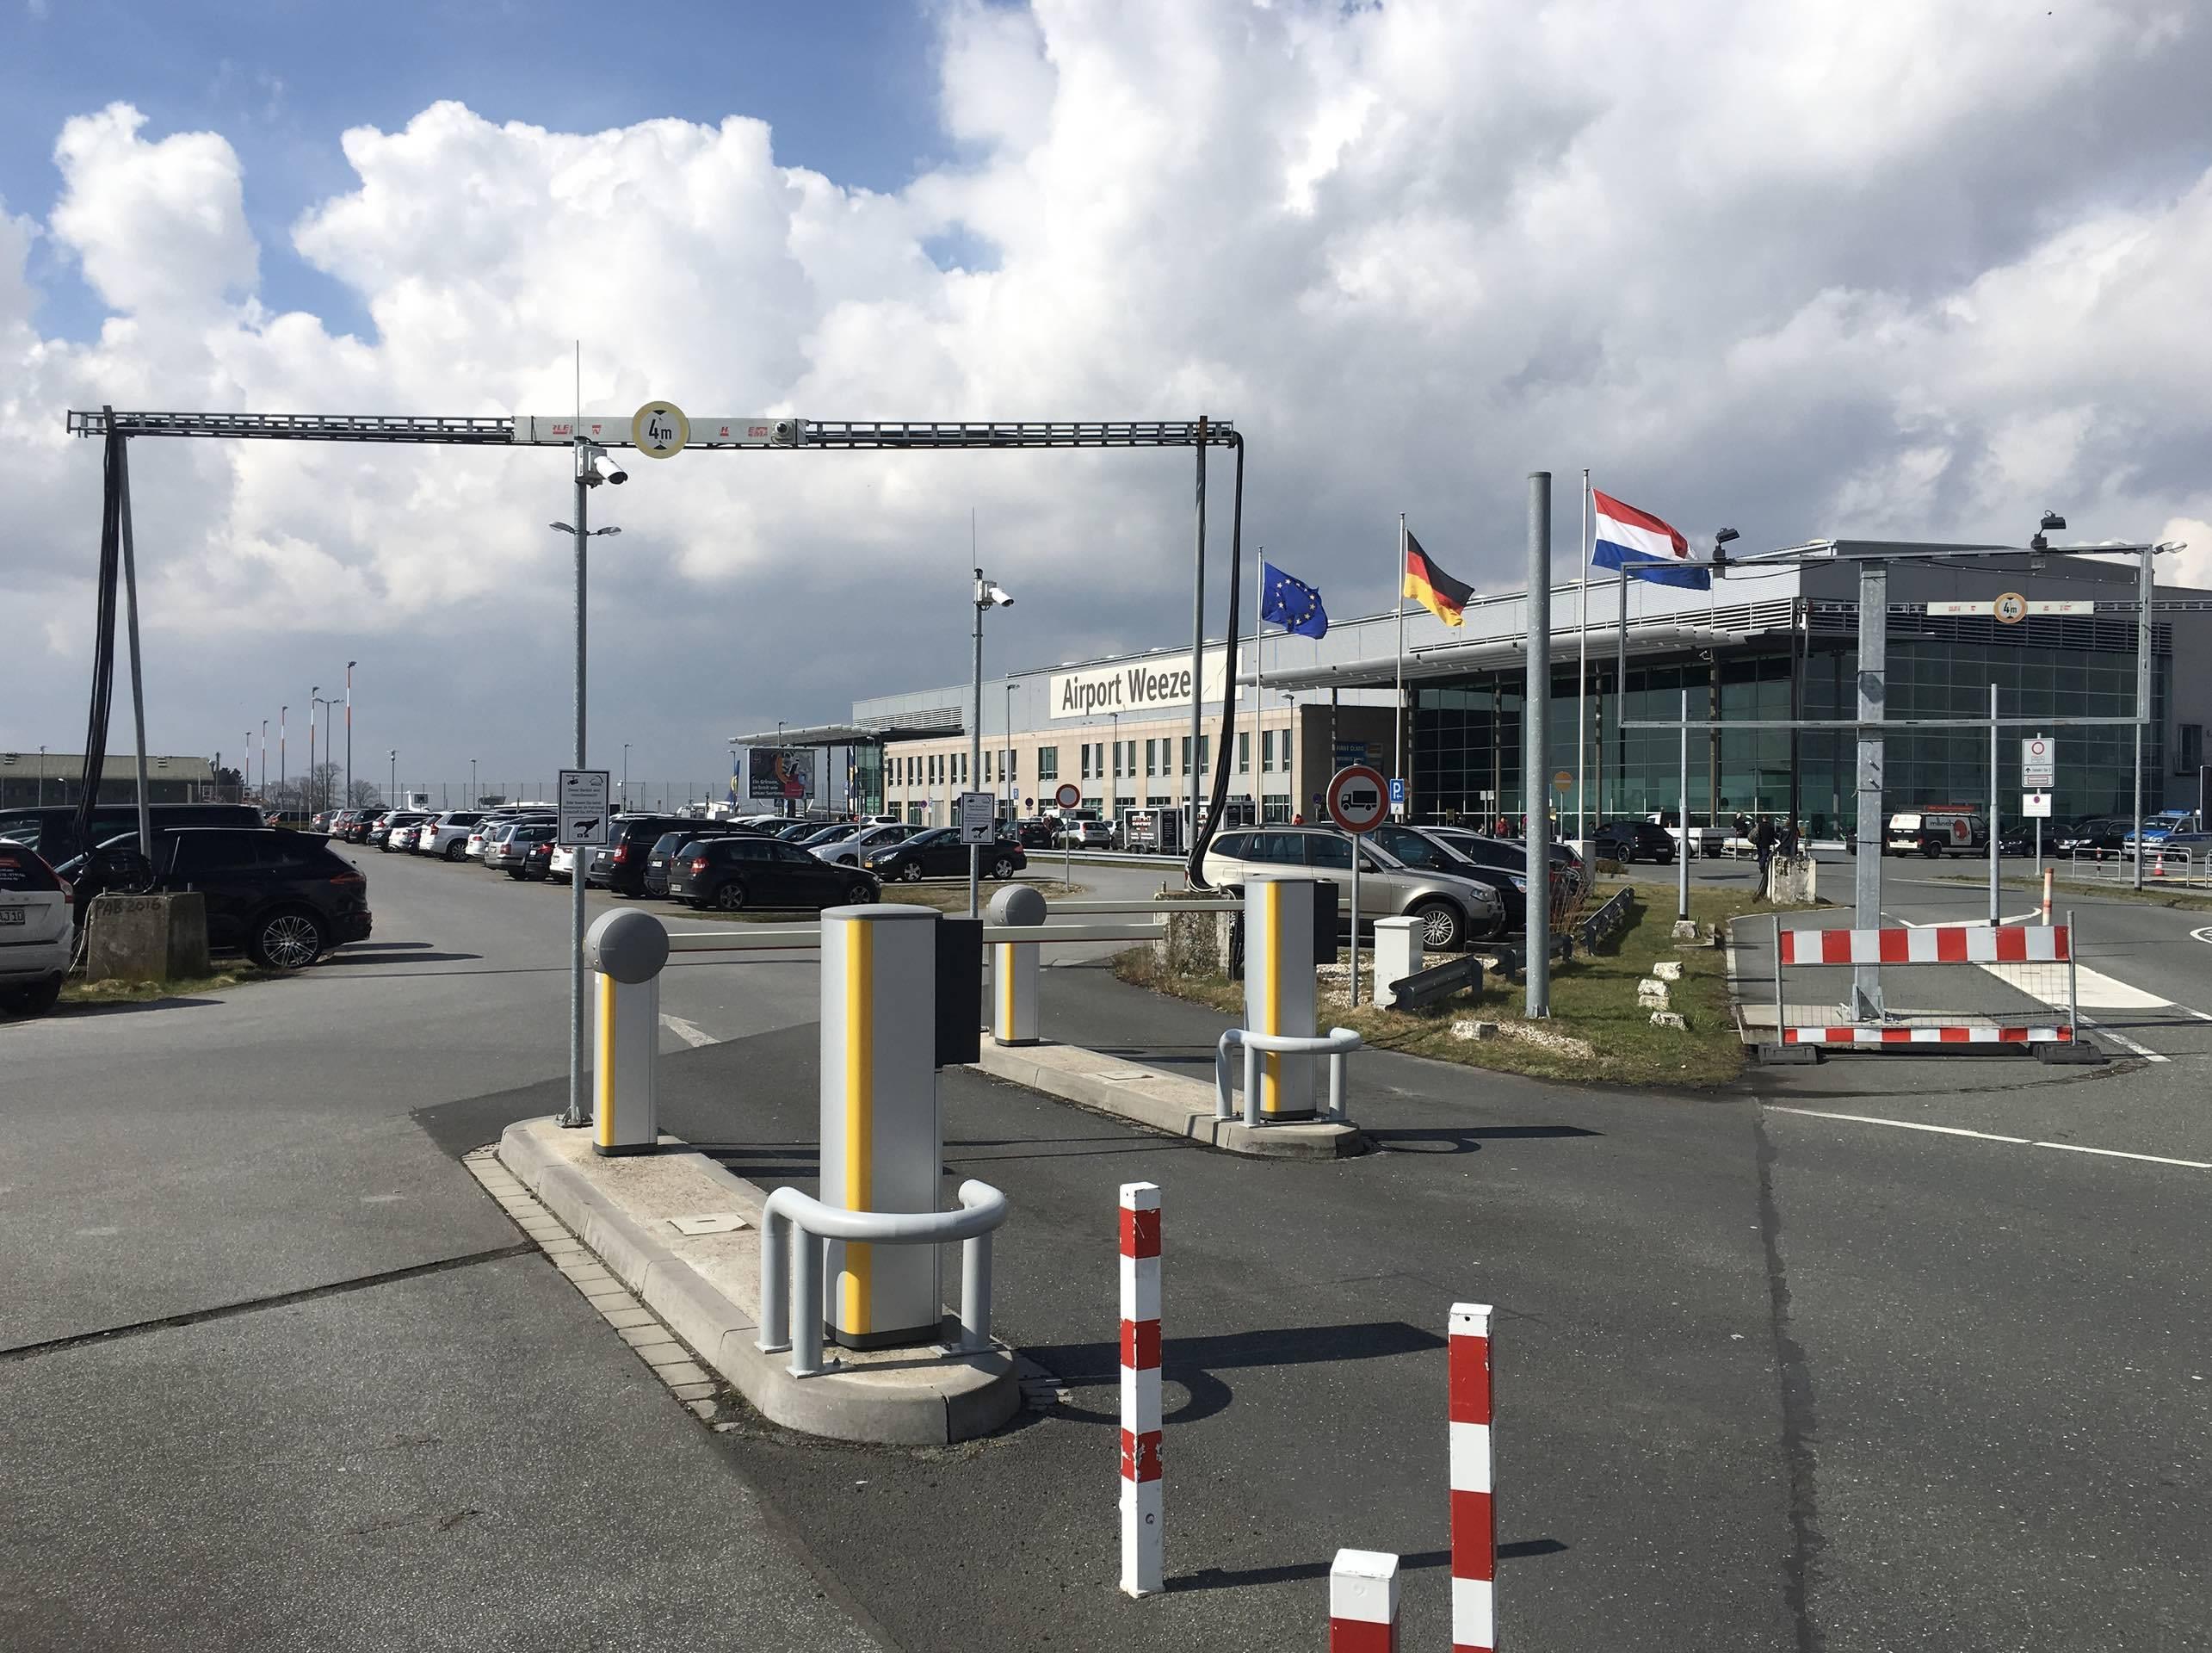 Bus - airport weeze - flughafen